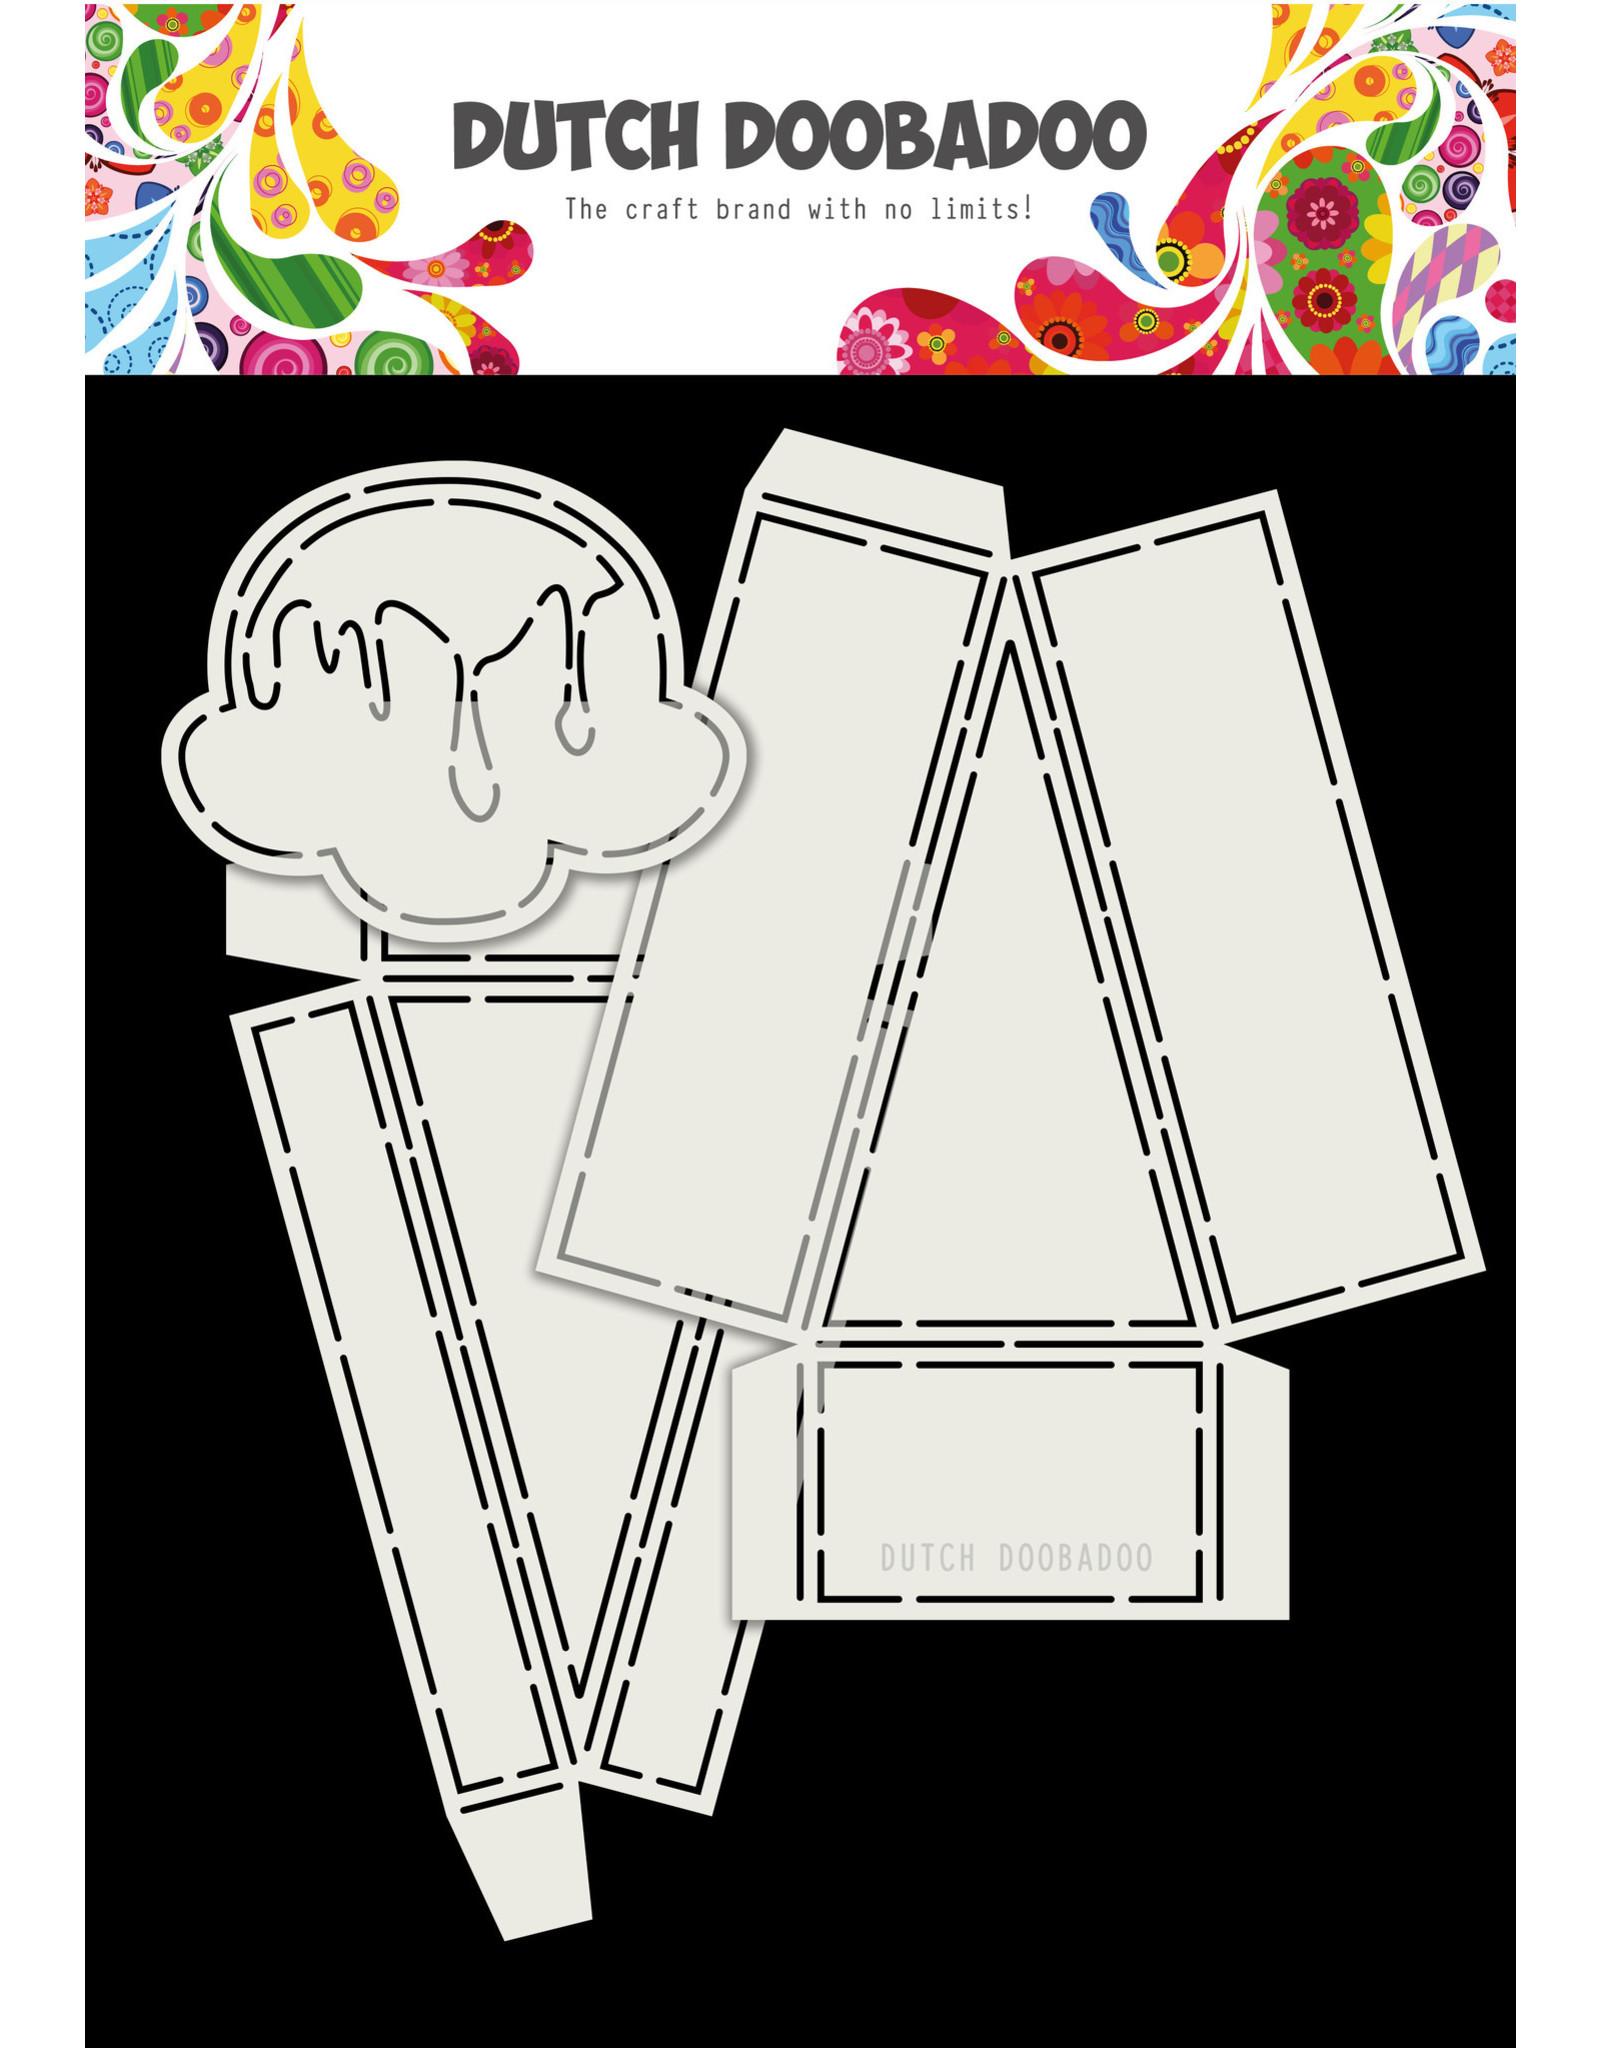 Dutch Doobadoo DDBD Dutch Box Art Ice cream set